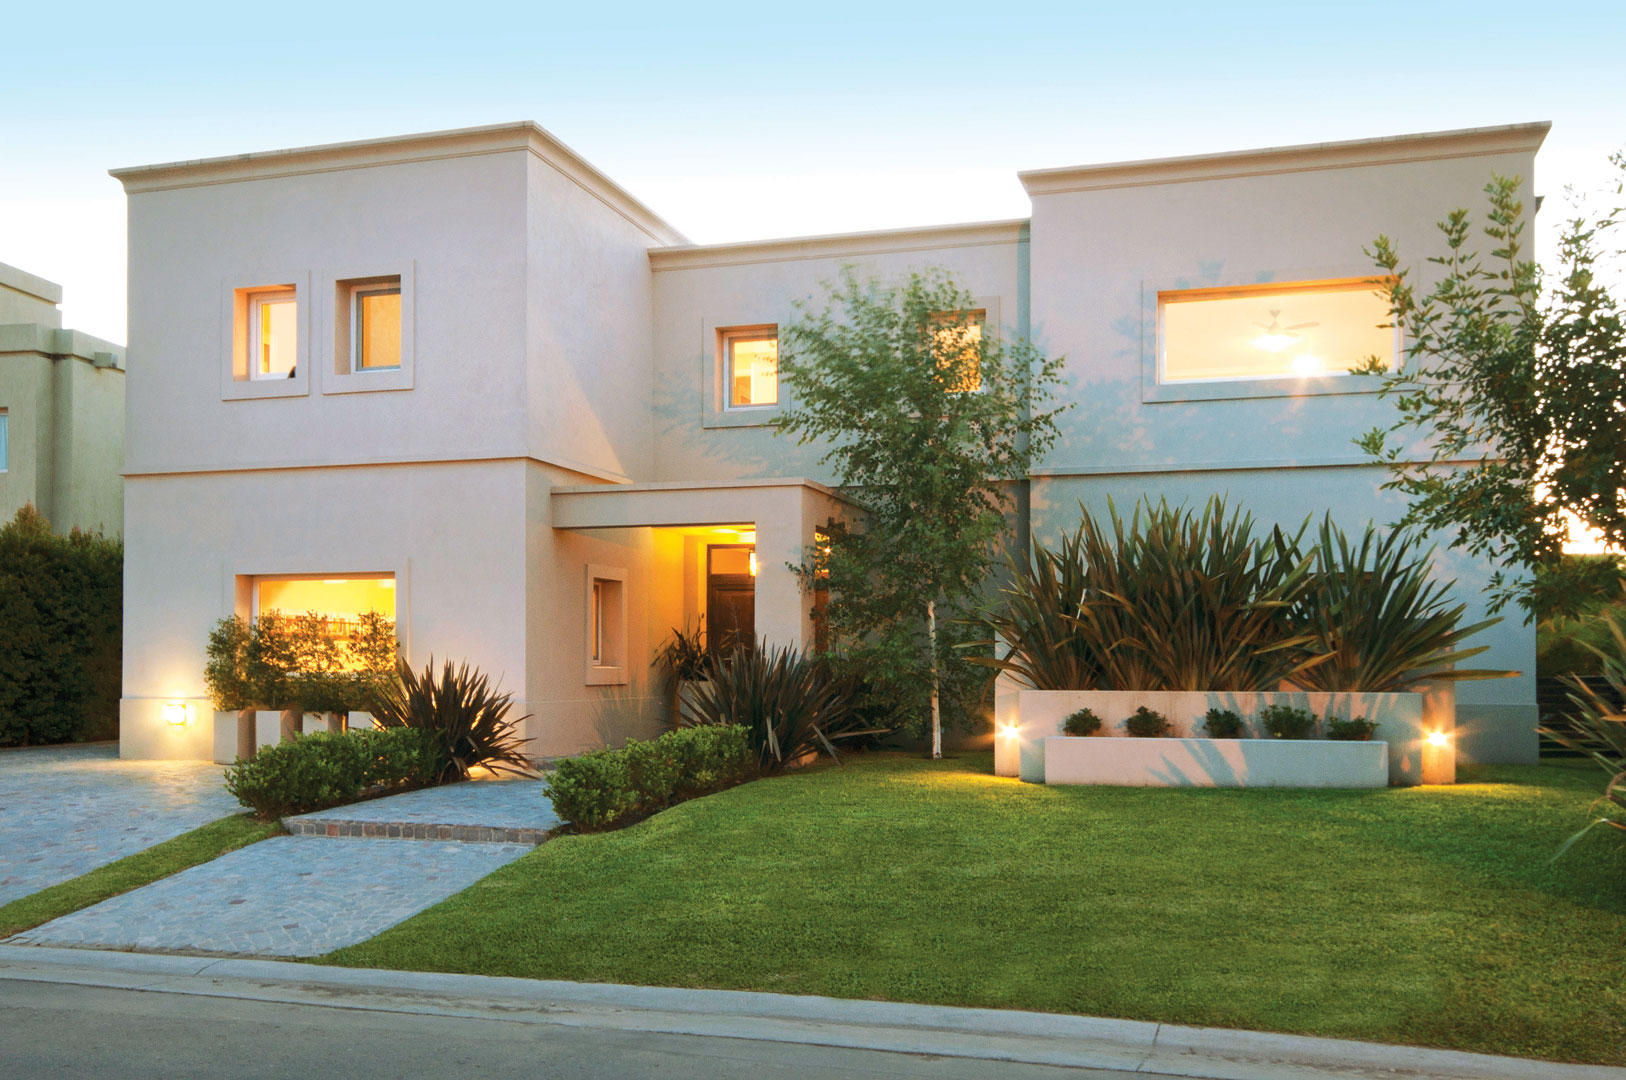 Estudio clari arquitectura casa estilo actual portal - Estudios de arquitectura en cordoba ...